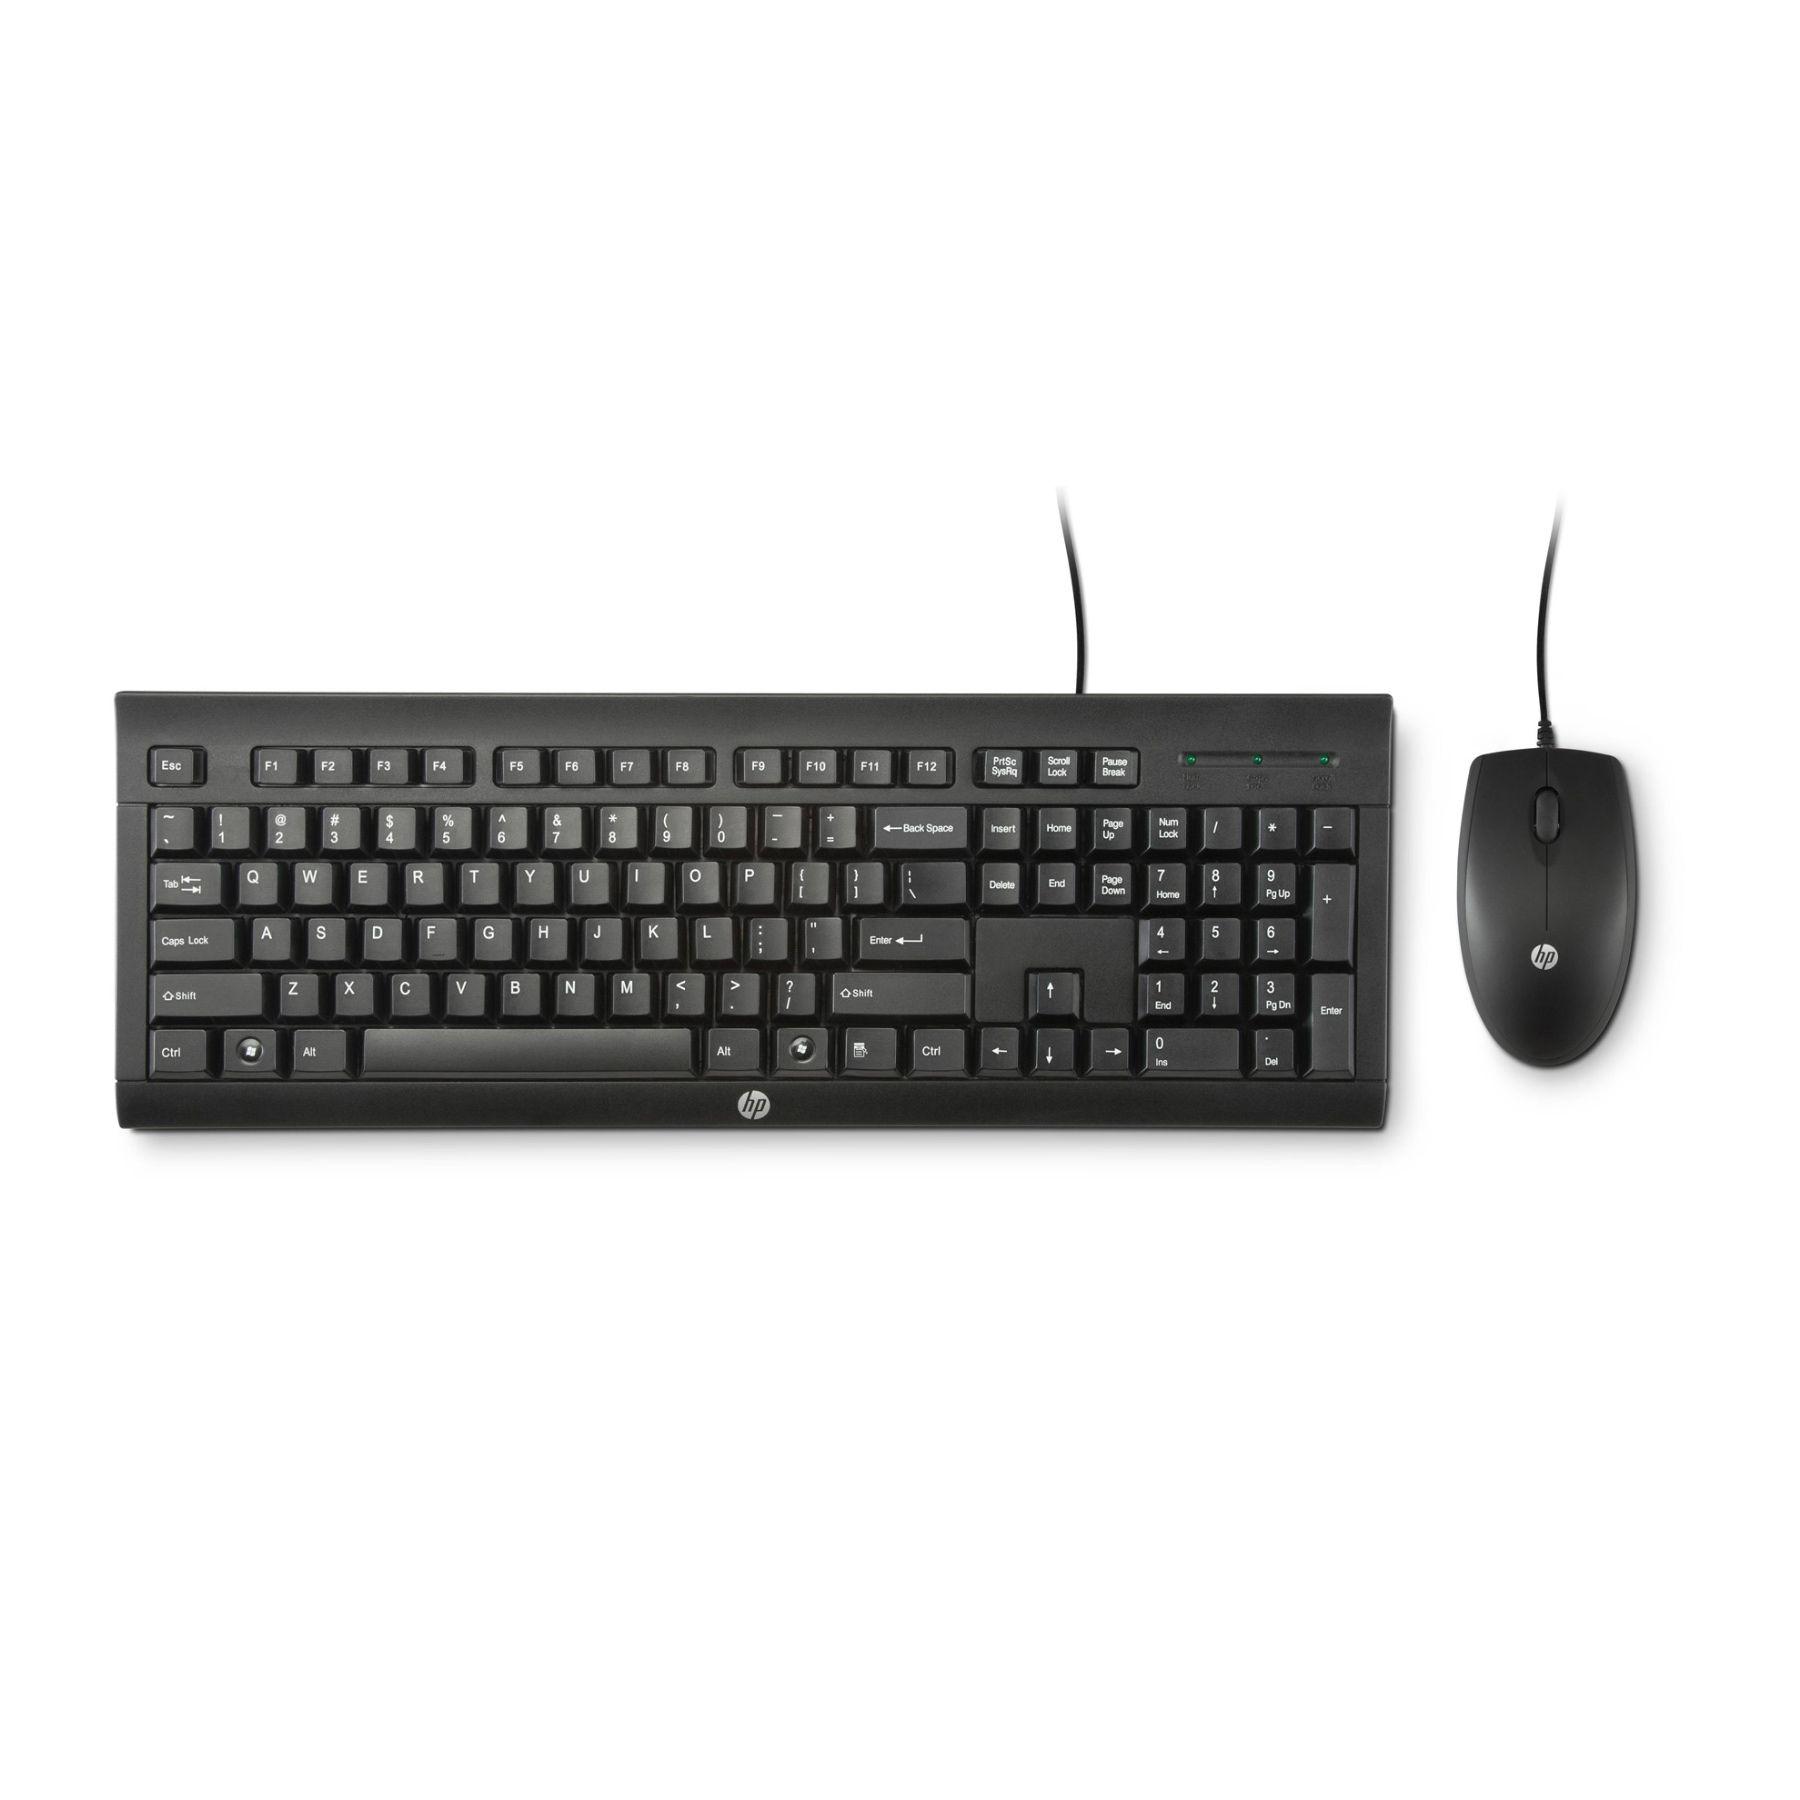 KIT Teclado E Mouse Óptico Com Fio USB HP C2500 Preto